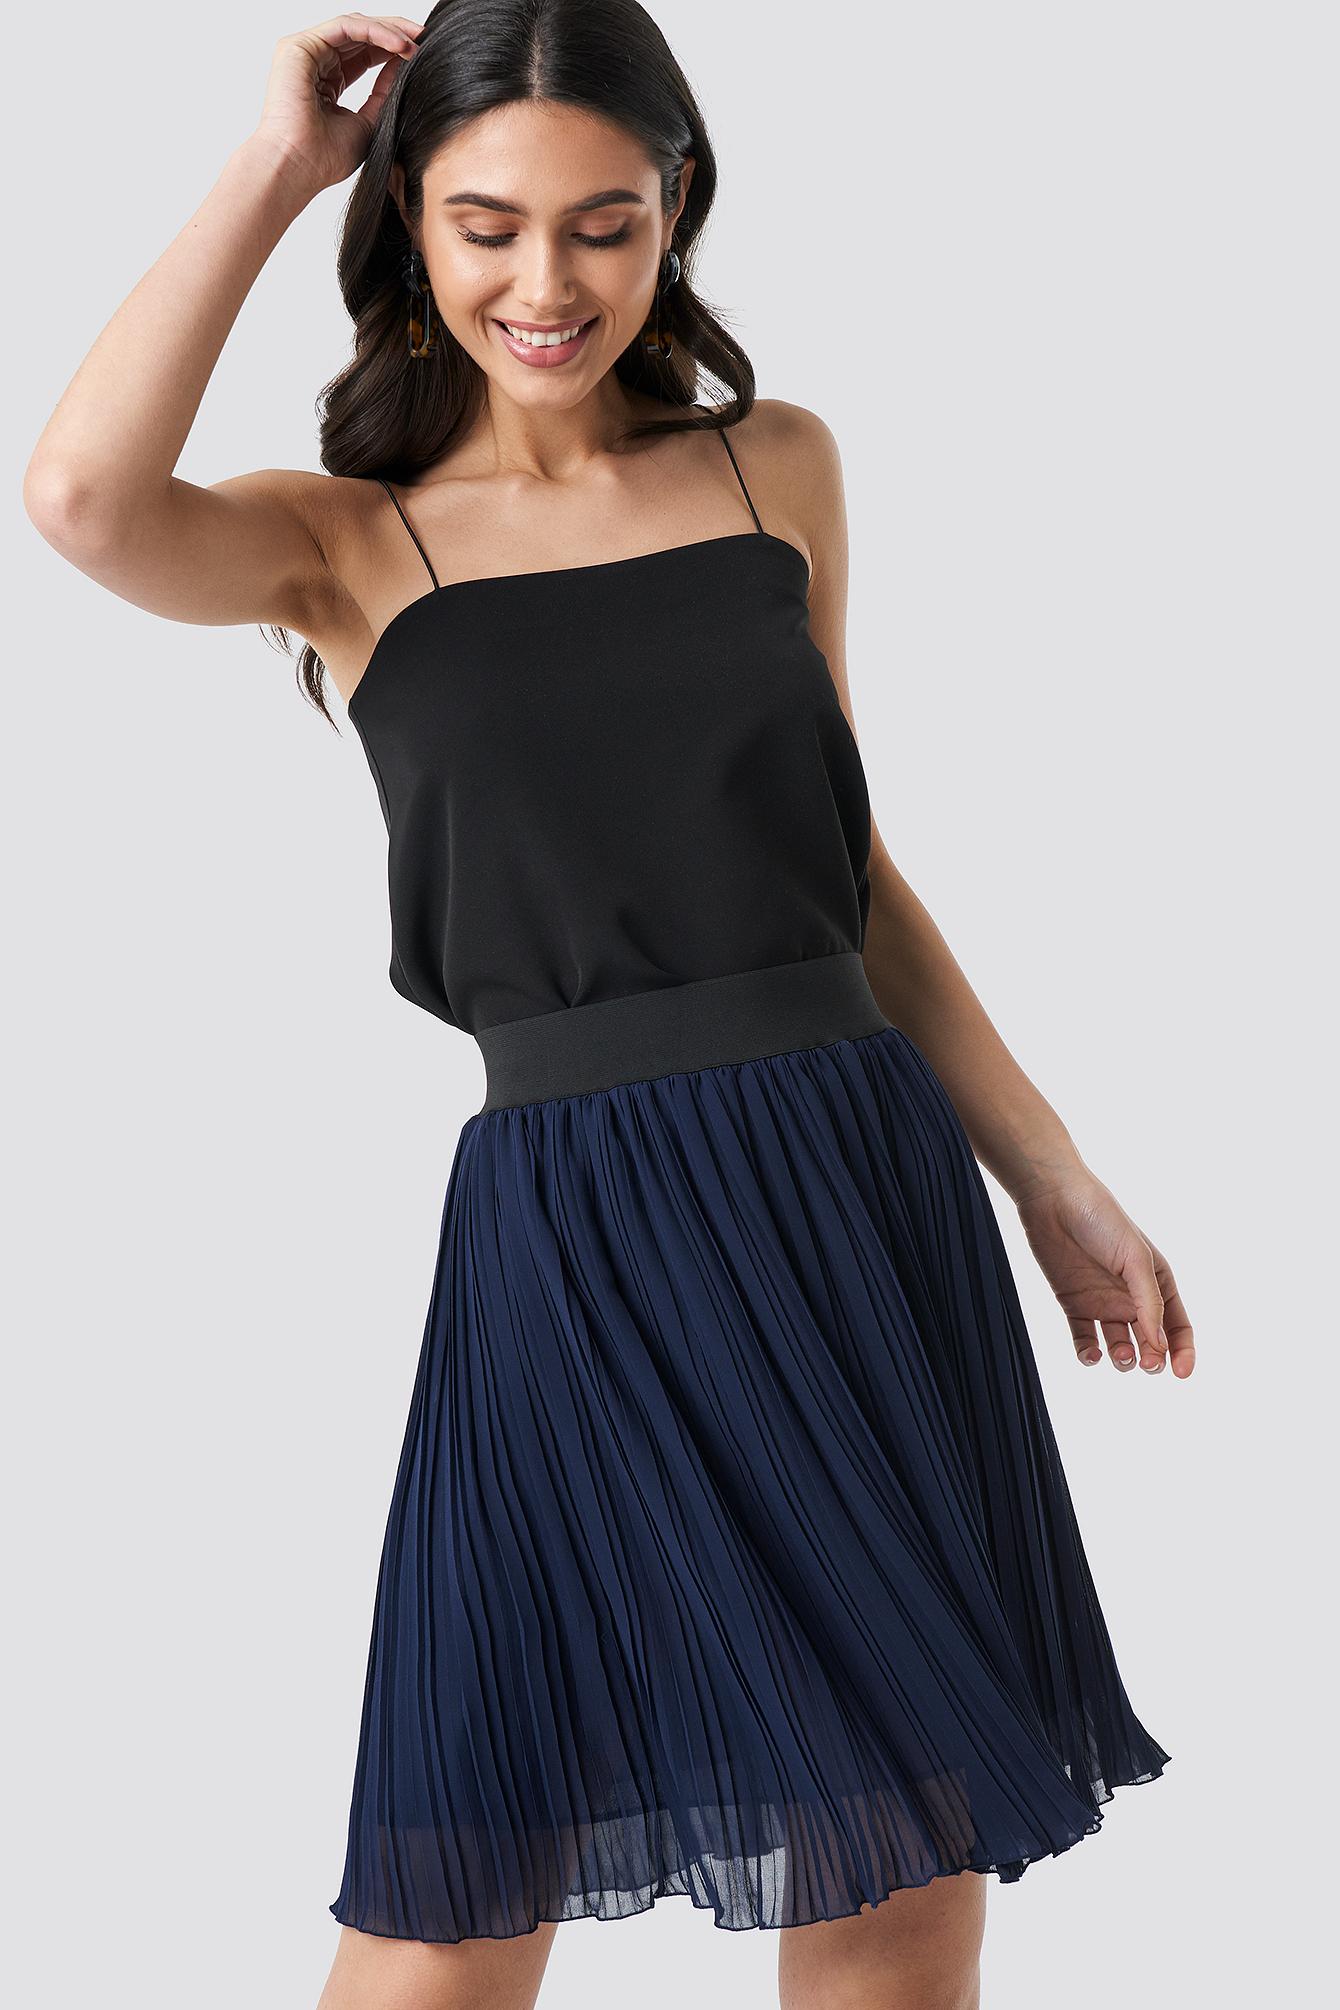 Indigo Pleated Skirt NA-KD.COM